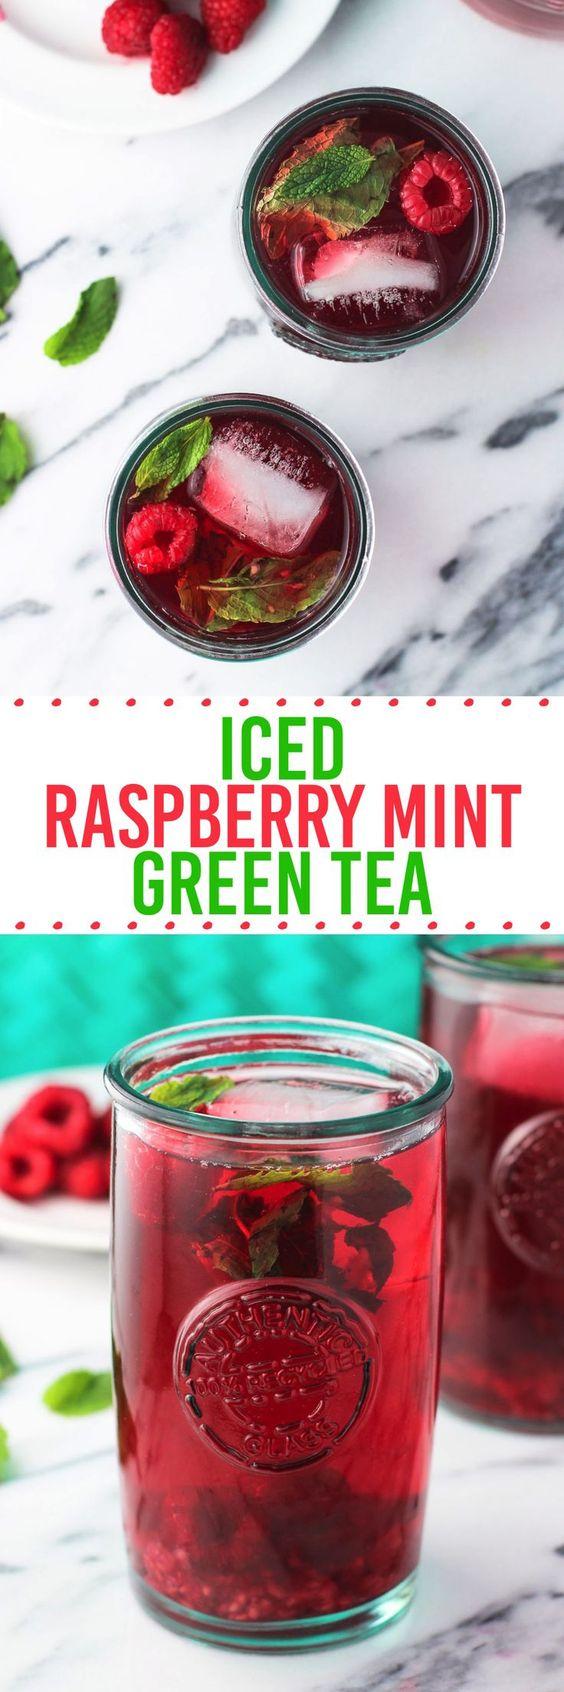 Iced Raspberry Mint Green Tea - an easy, fruity iced tea recipe with no sweetener needed! ad